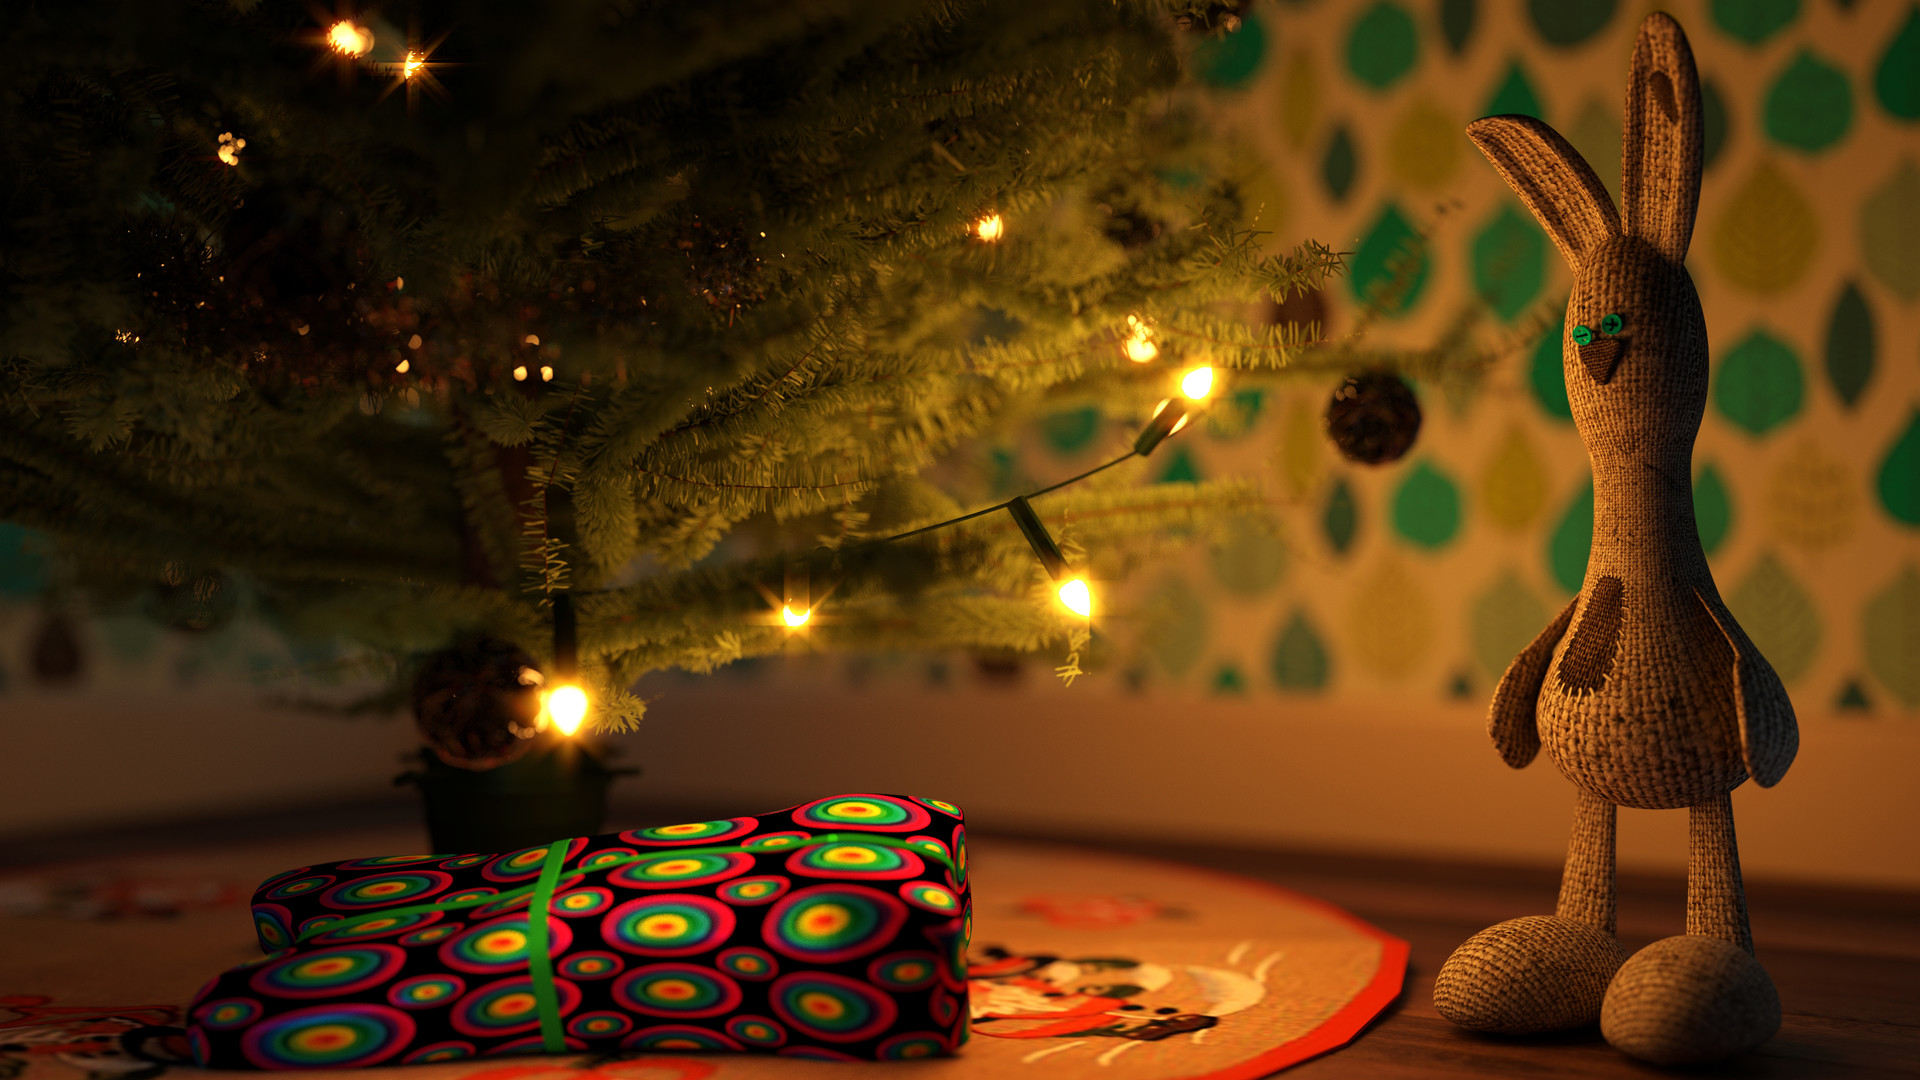 Sussi johansson christmas10